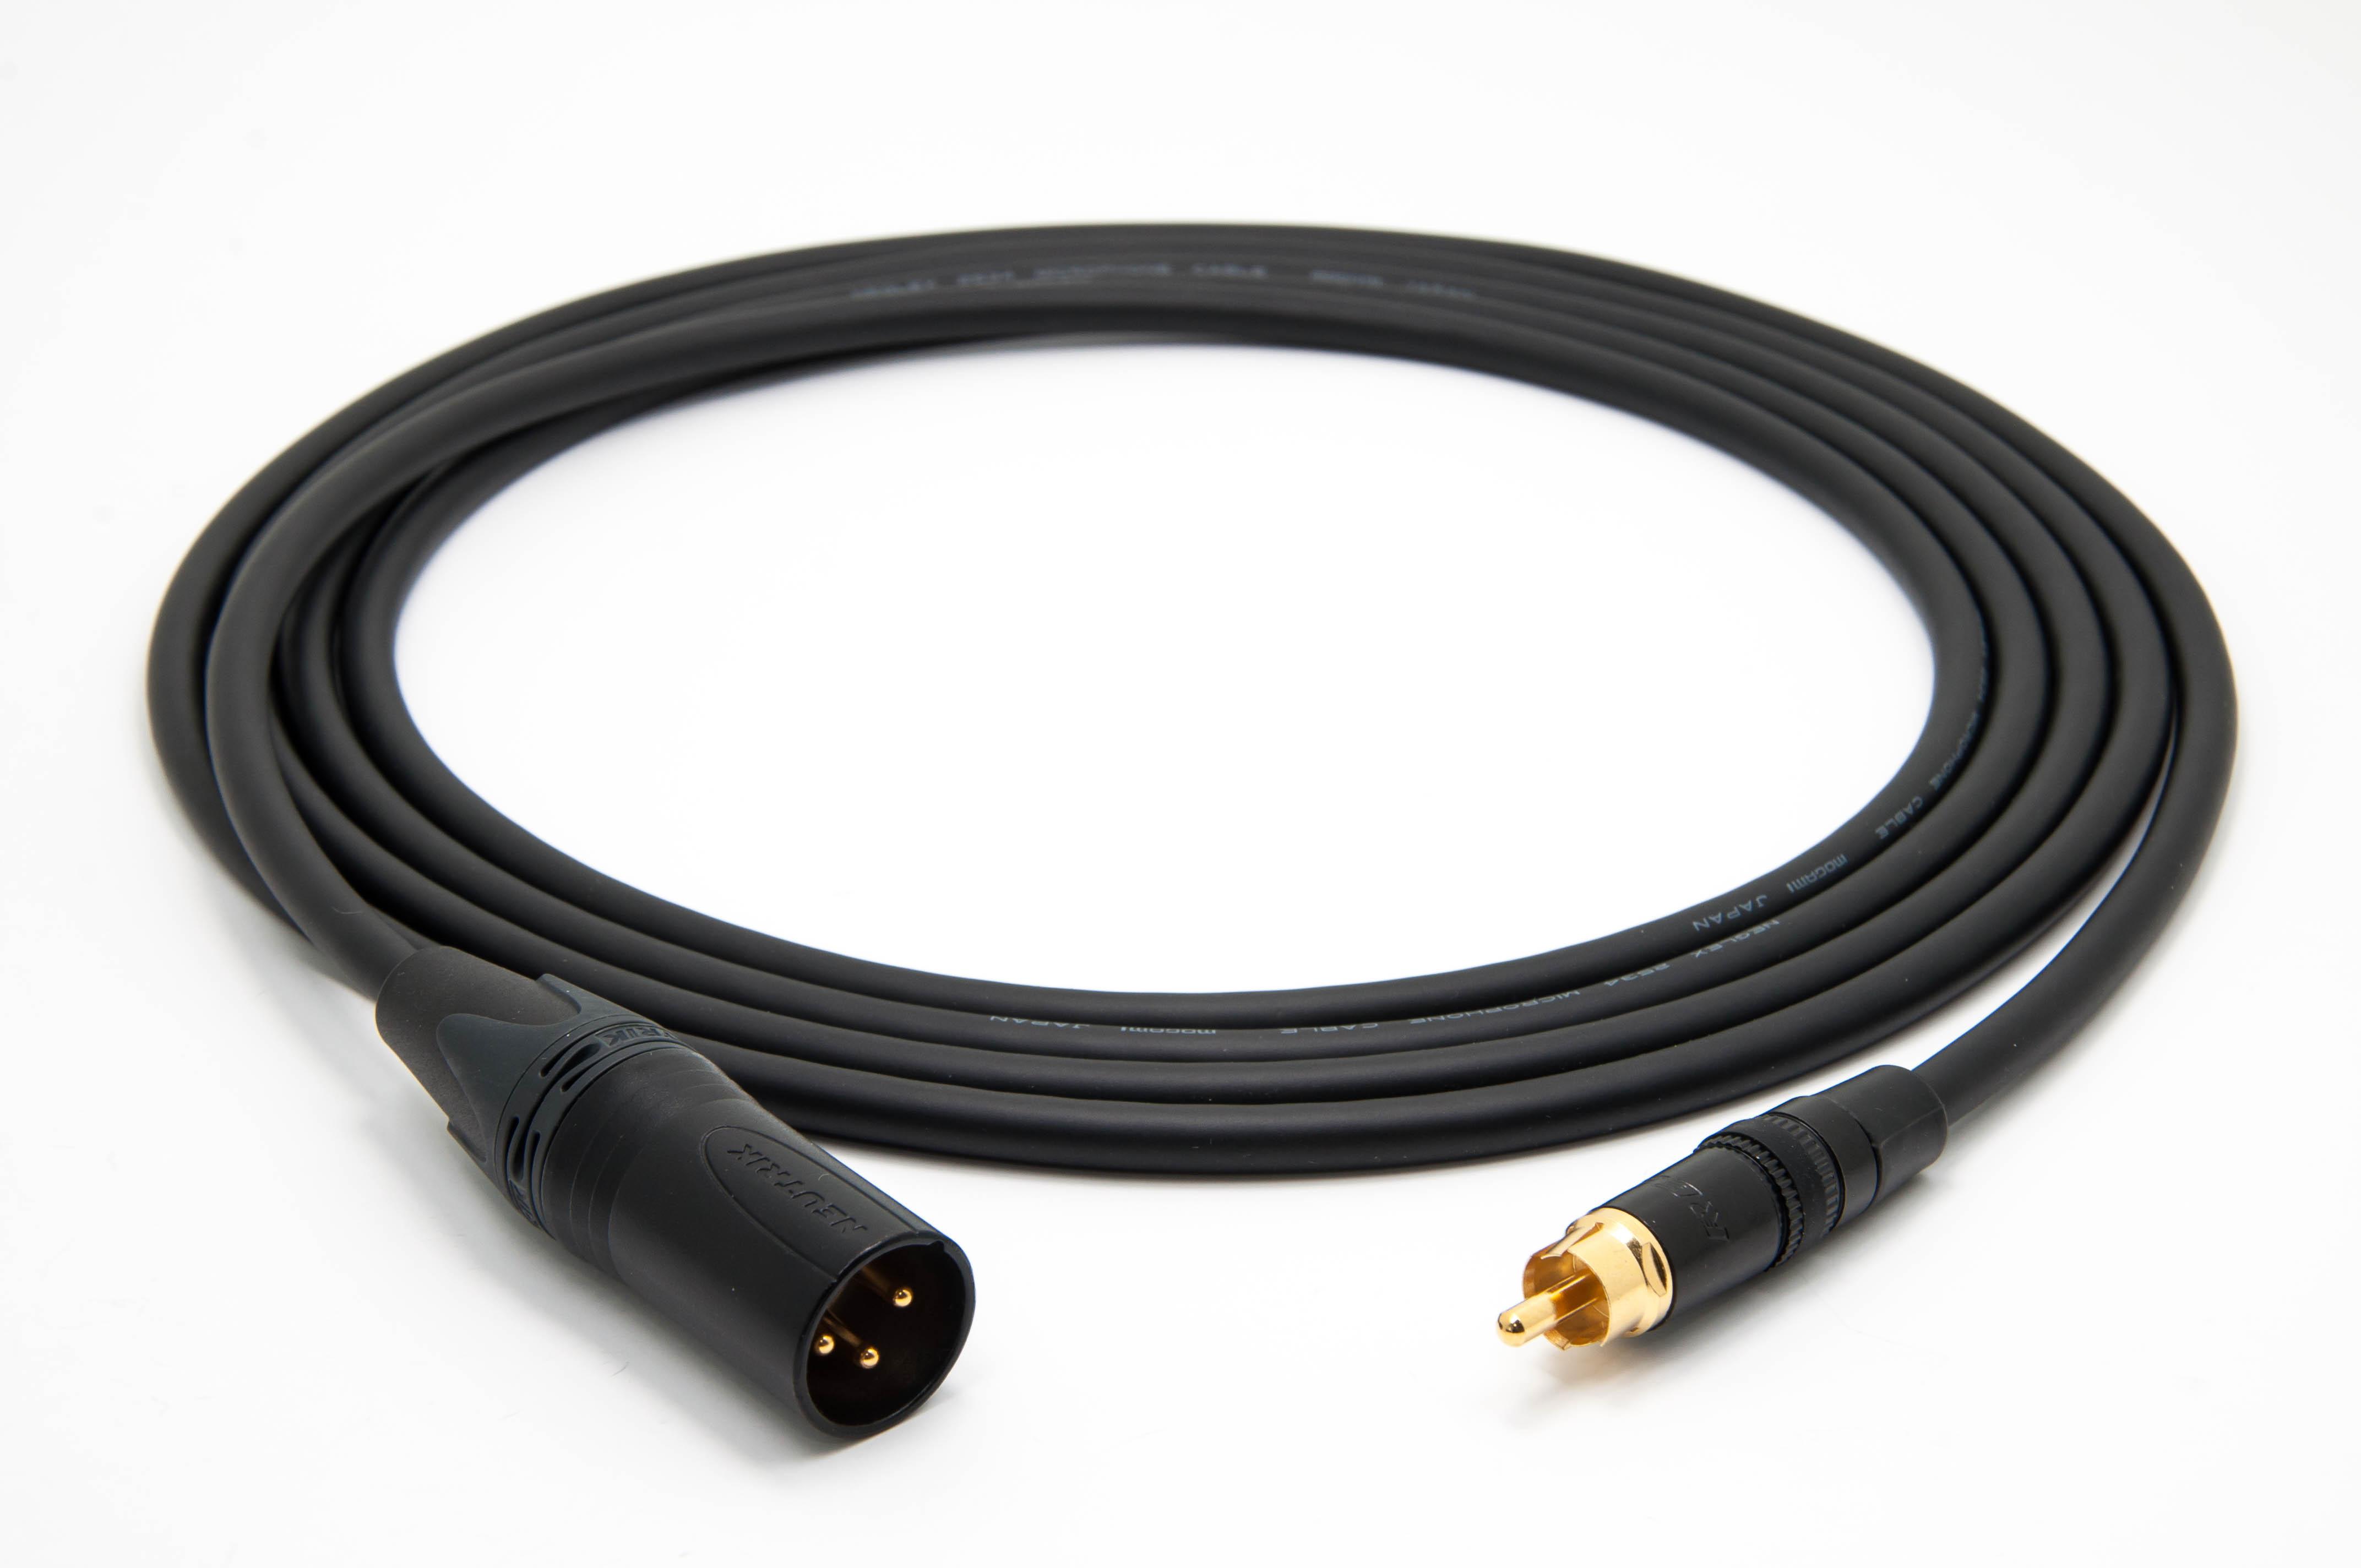 0.5 Meter Mogami 2964 Cable and Neutrik-Rean Connectors RCA Audio Cable Pair